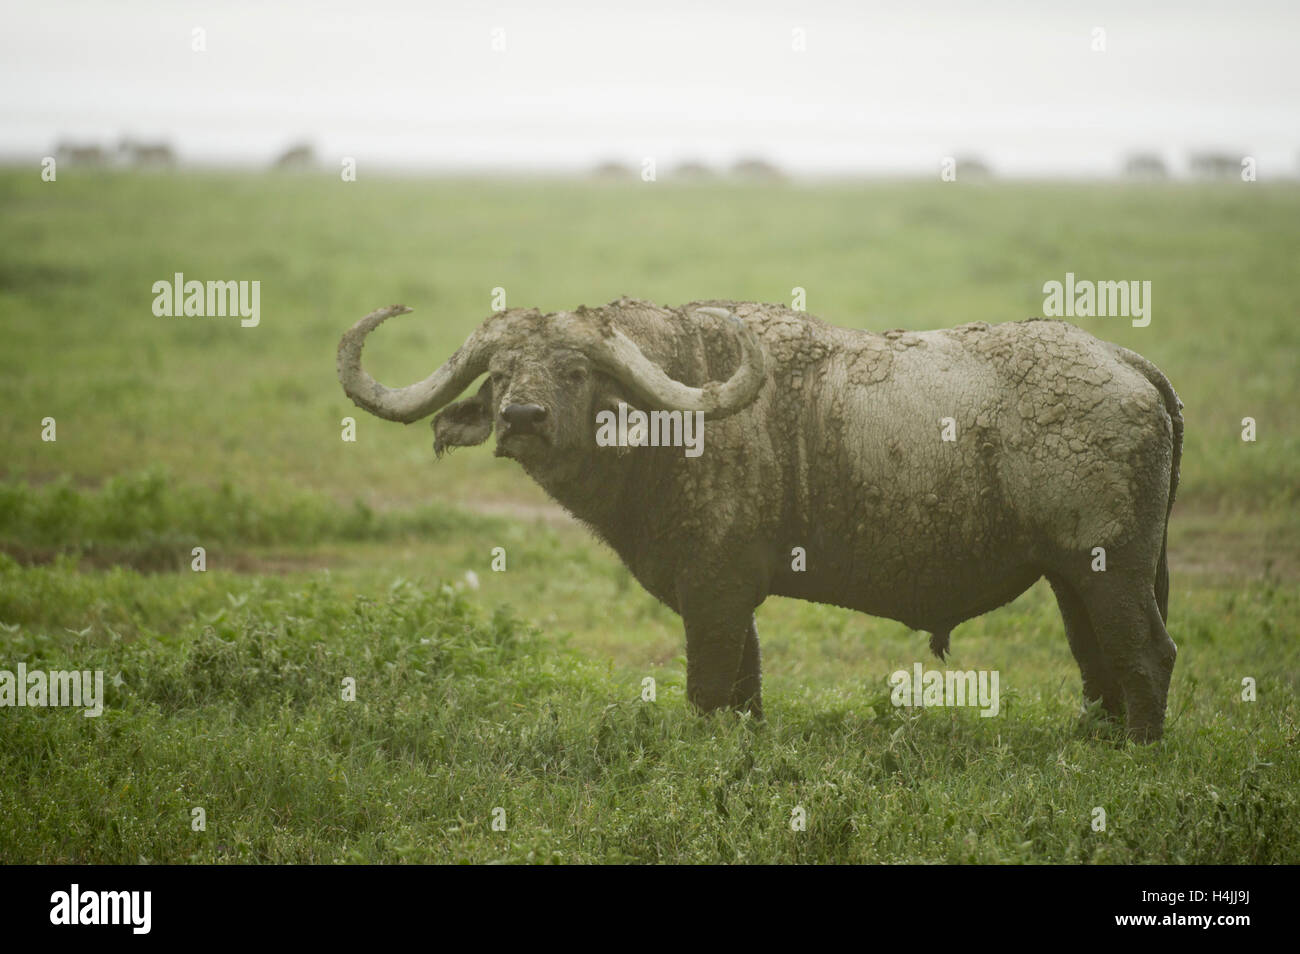 Buffalo bull (Syncerus caffer caffer), le cratère du Ngorongoro, en Tanzanie Banque D'Images